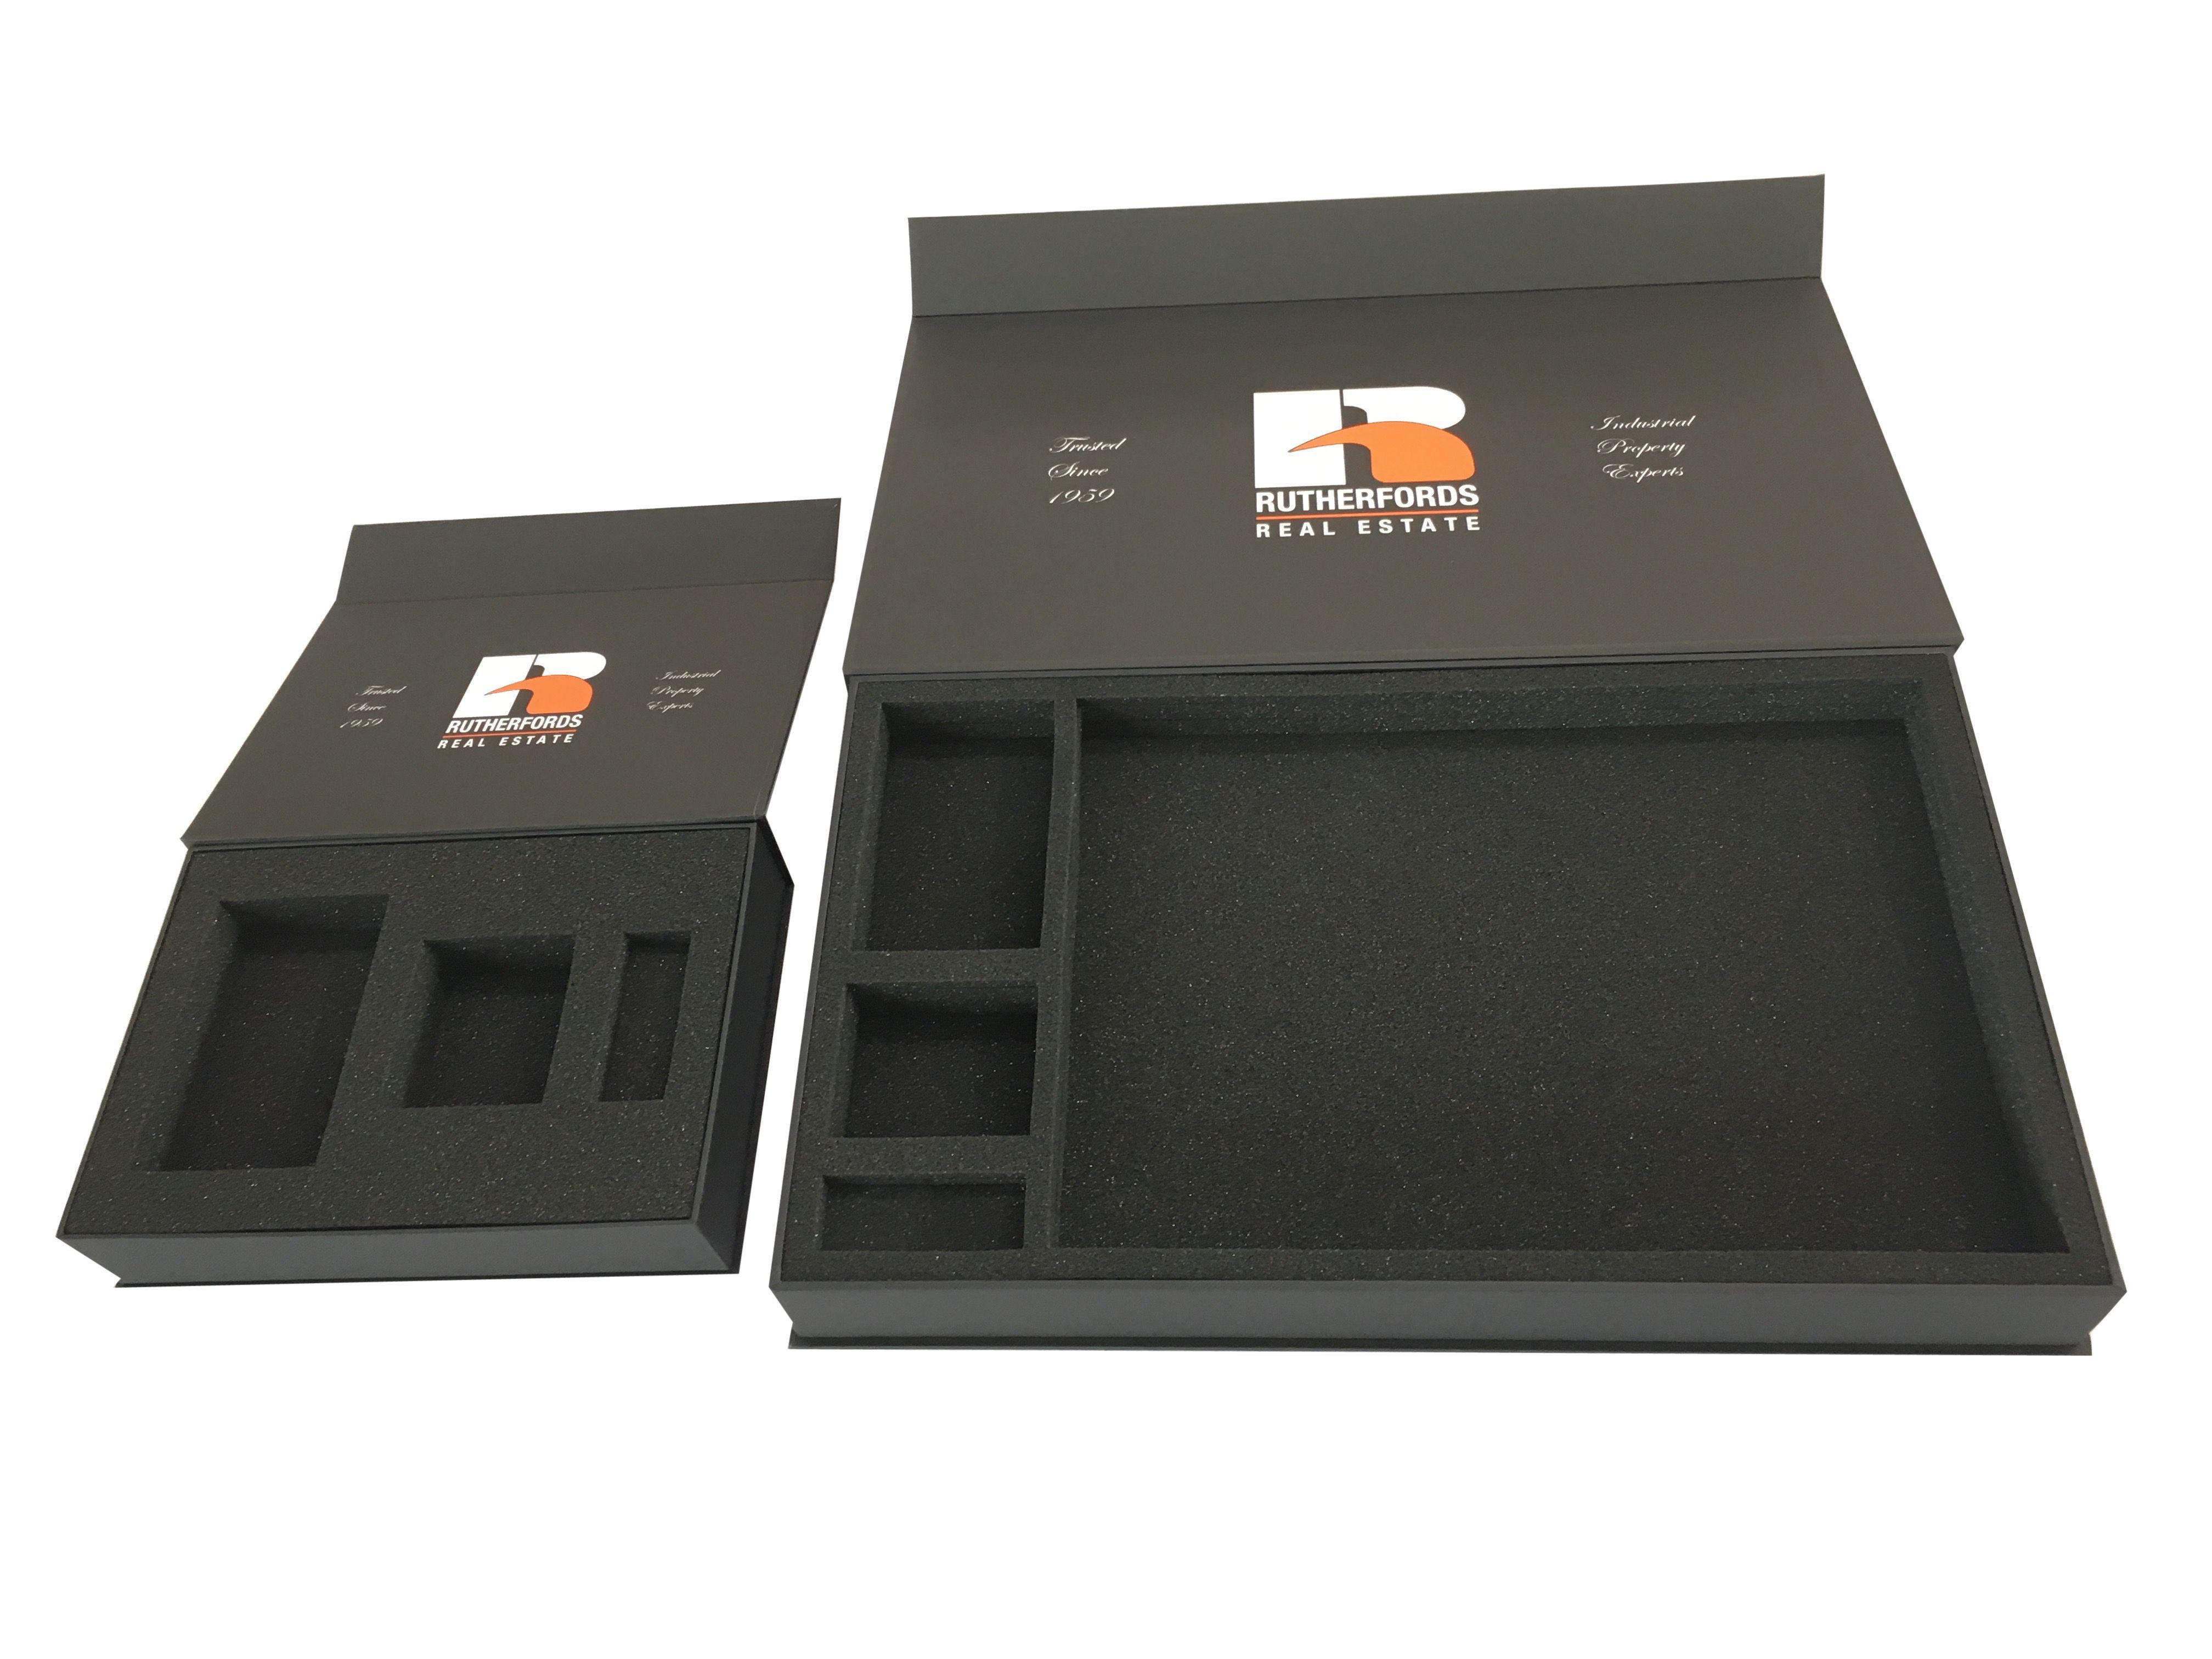 Handover Box Settlement Box For Real Estate Gift Boxes Premium